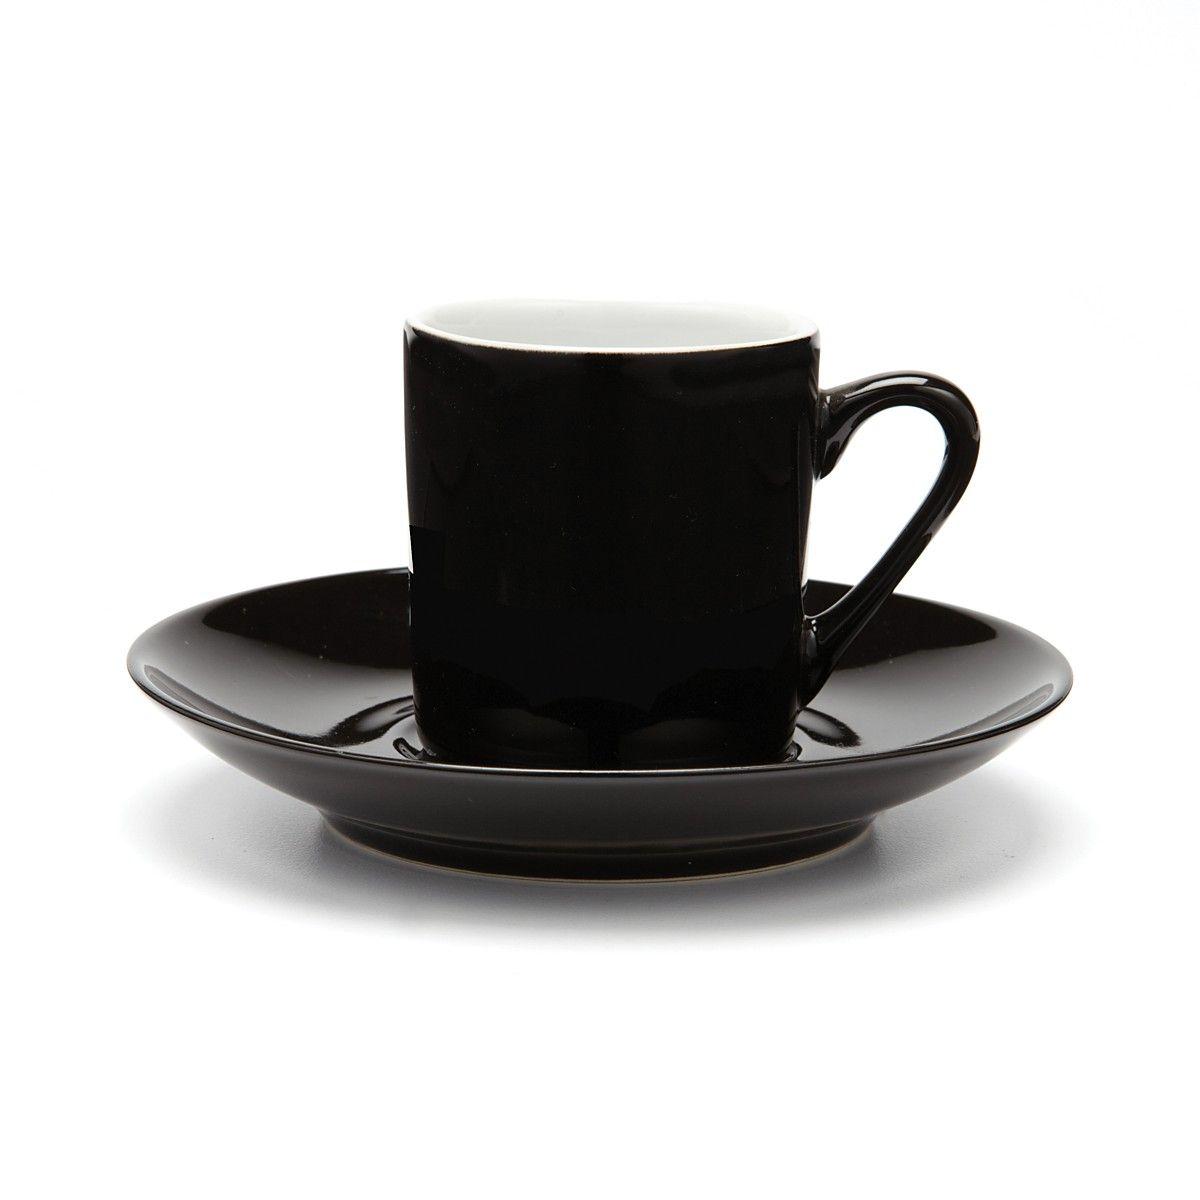 BIA Cordon Bleu Espresso Cup and Saucer | Bloomingdales  sc 1 st  Pinterest & BIA Cordon Bleu Espresso Cup and Saucer | Bloomingdales | Dinnerware ...